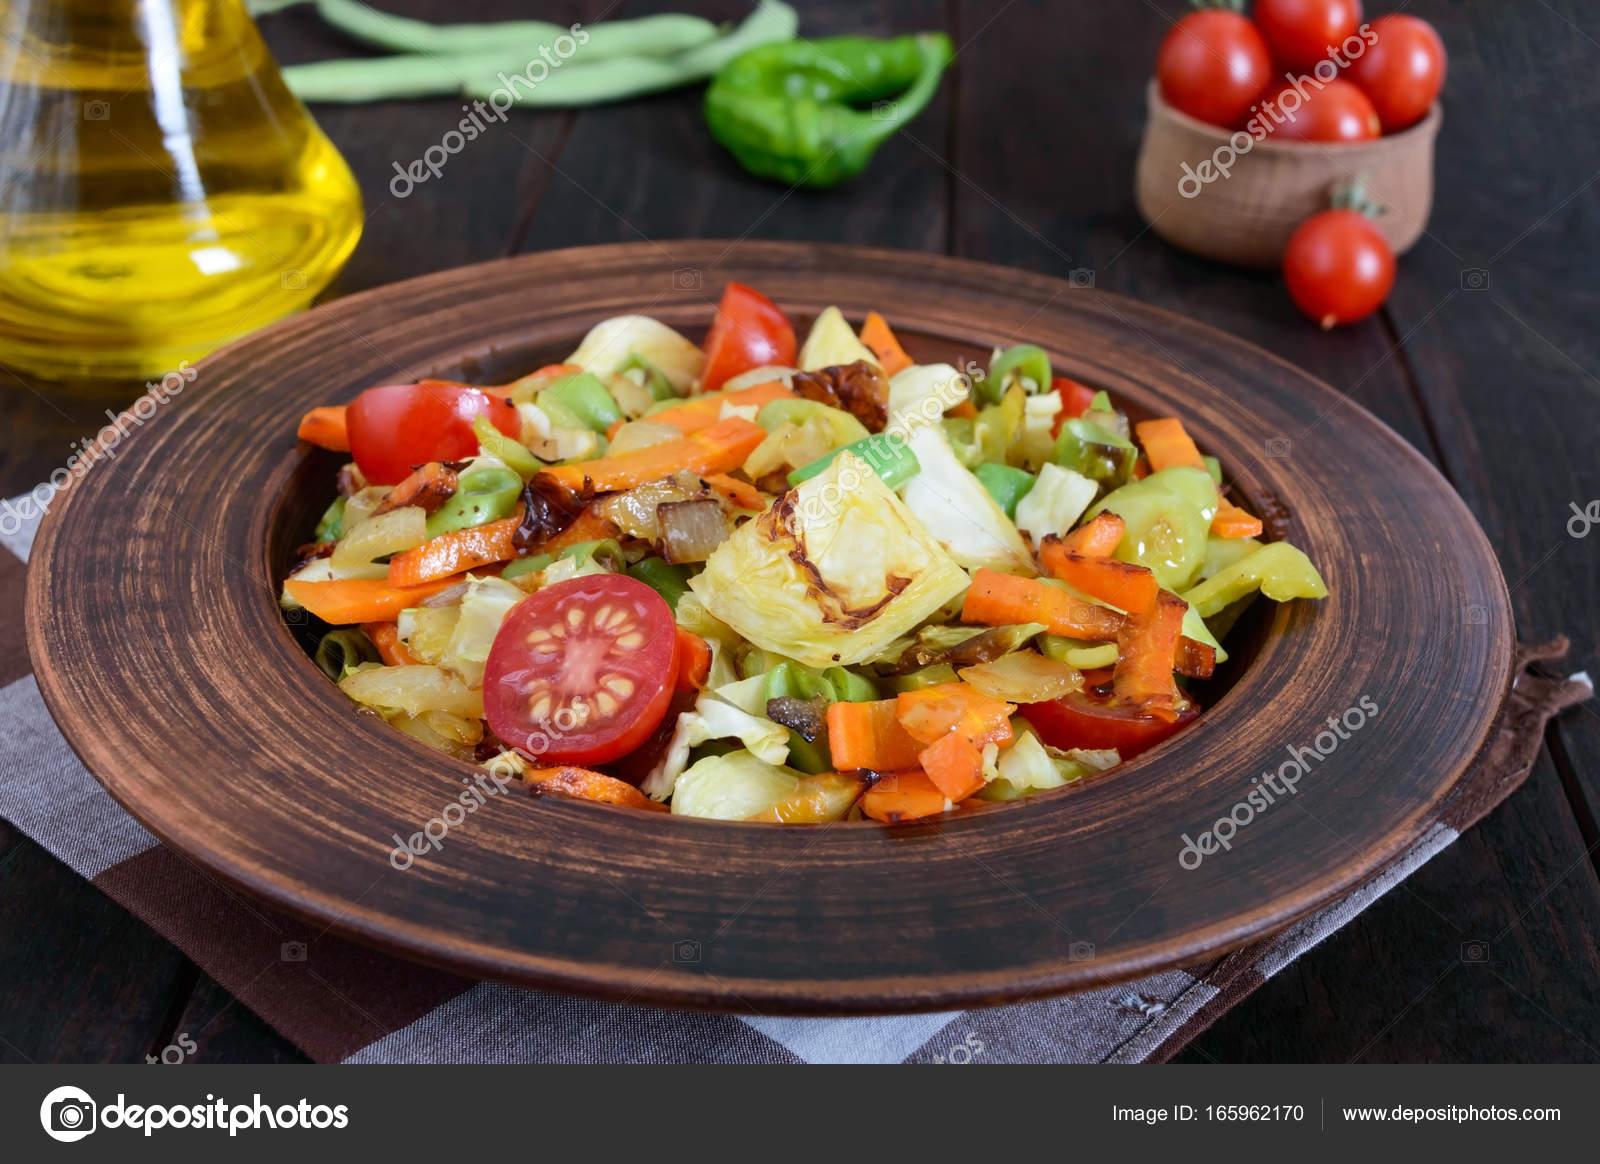 Салат фасоль морковь лук помидоры